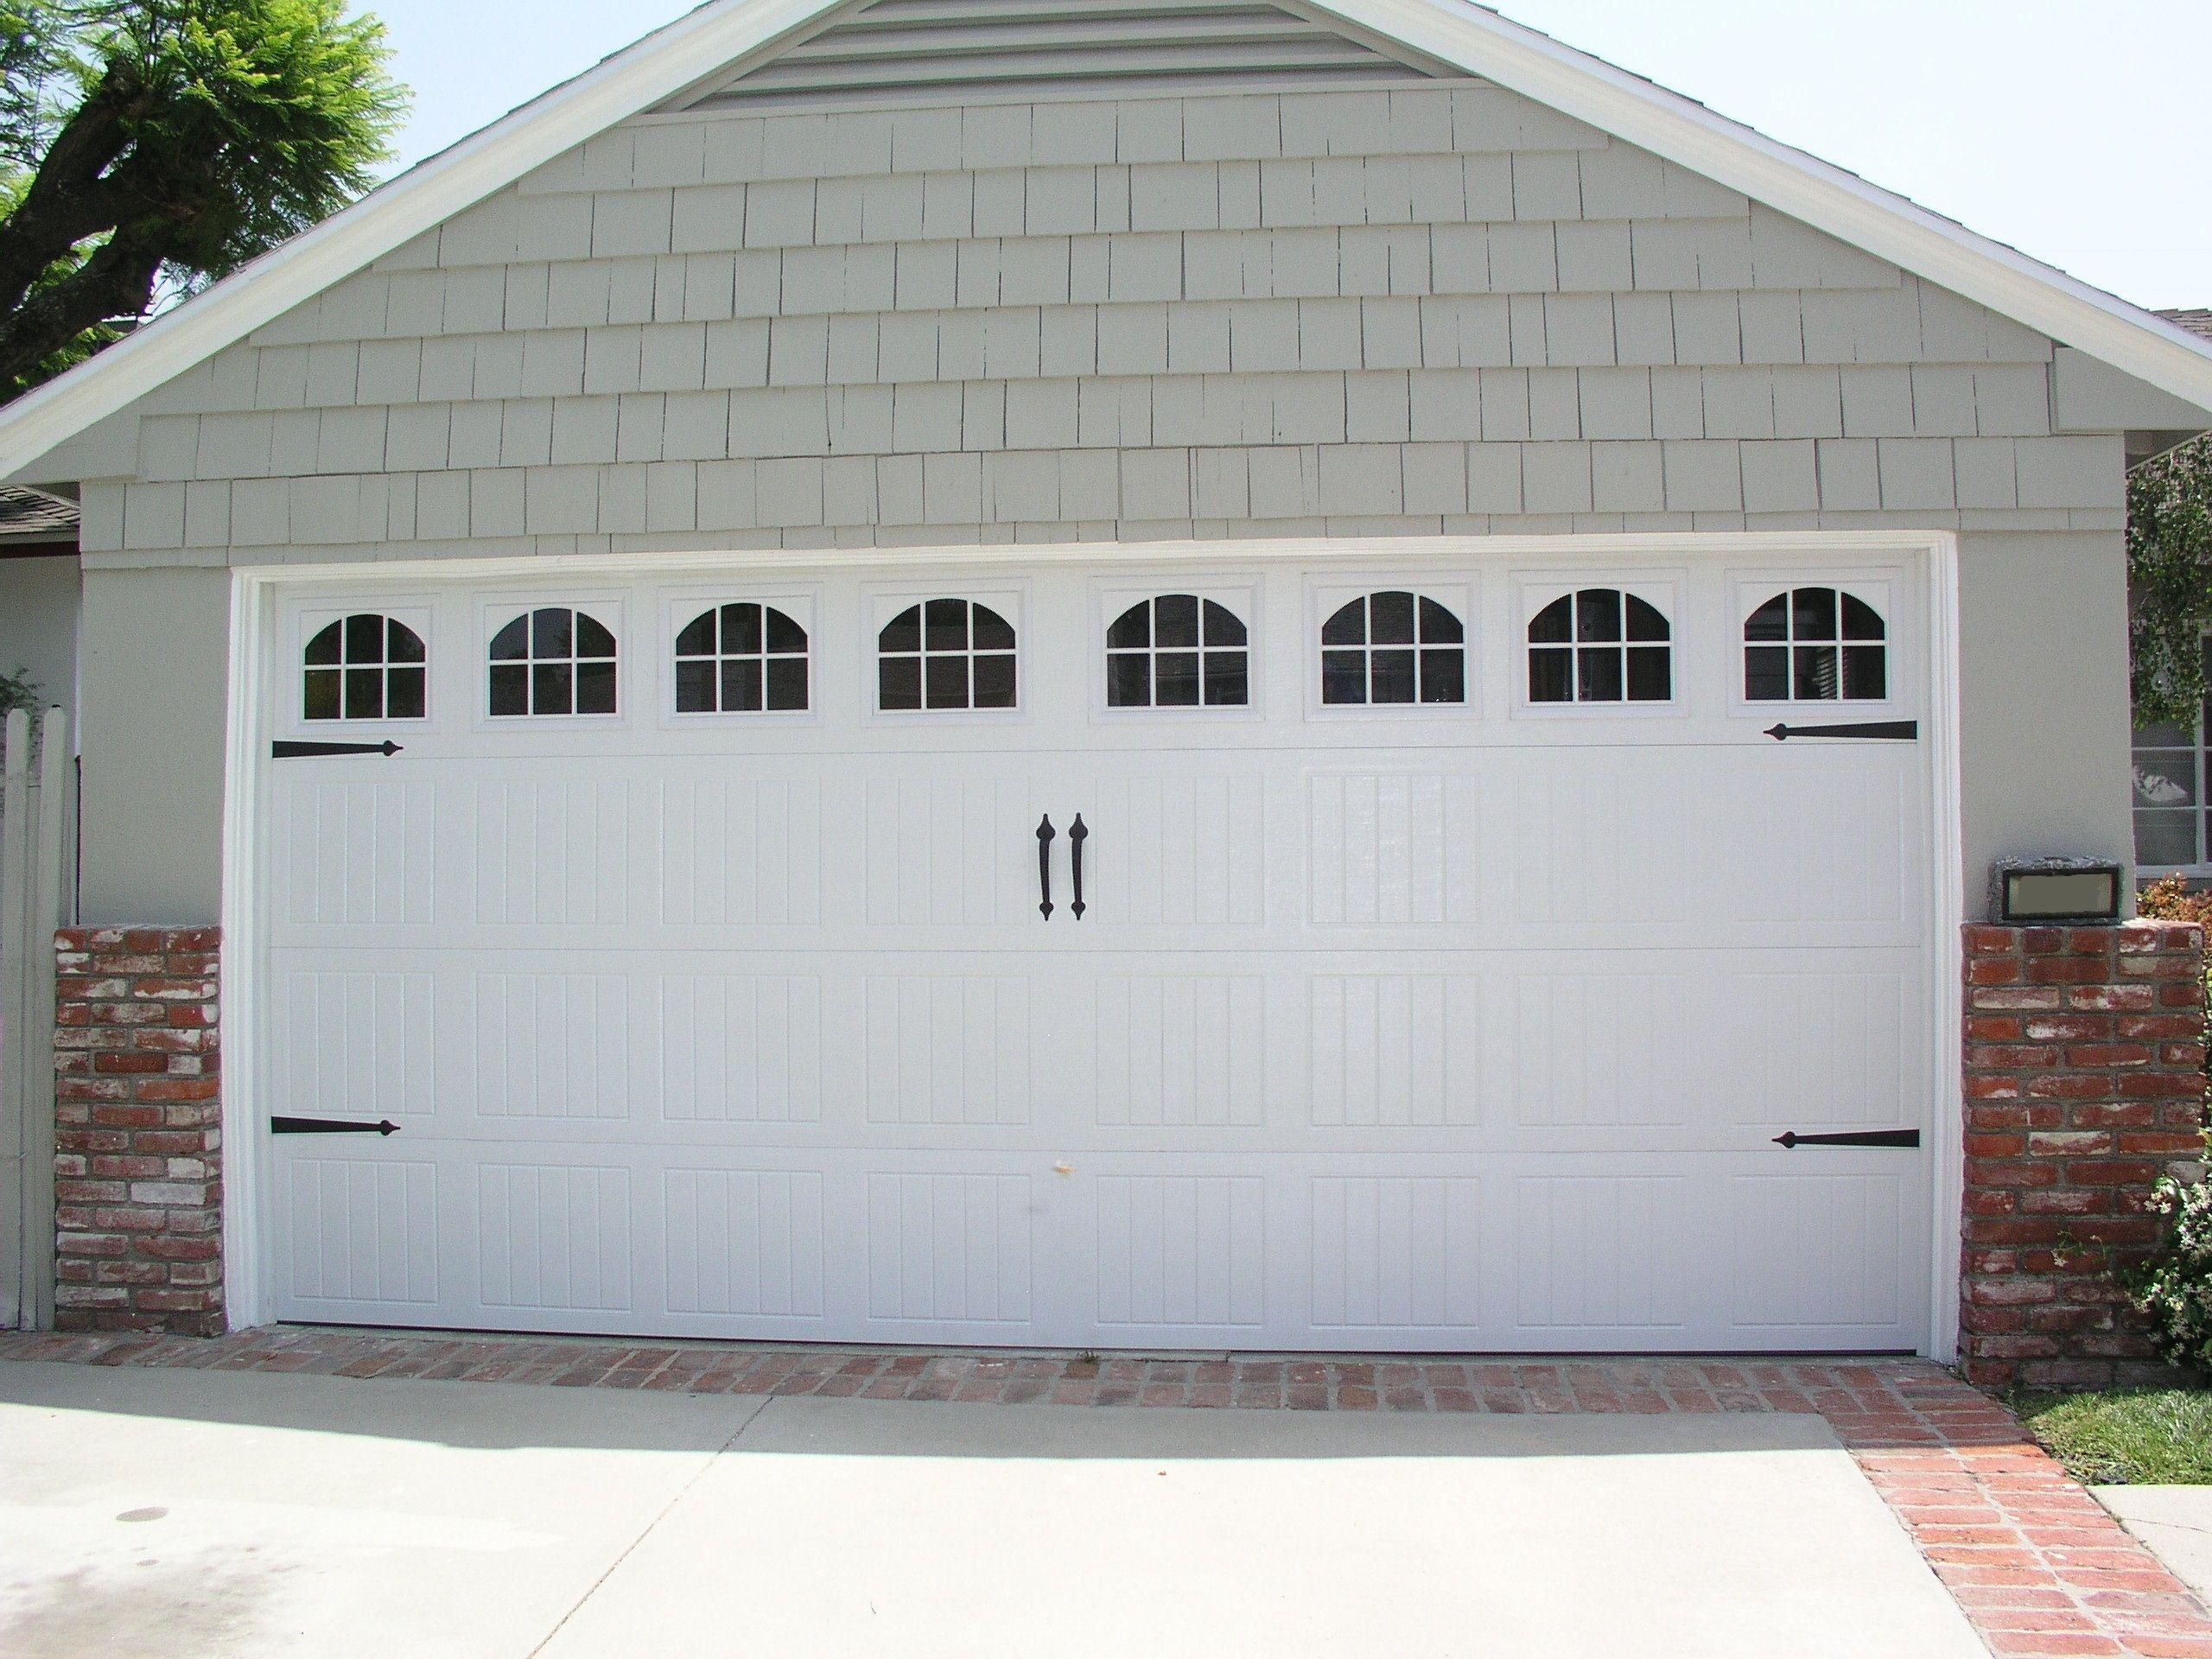 wayne dalton sonoma white cascade with decorative hardware los angeles ca photo credit agi dyer garagedoor garagedoors garages garage door  [ 2560 x 1920 Pixel ]